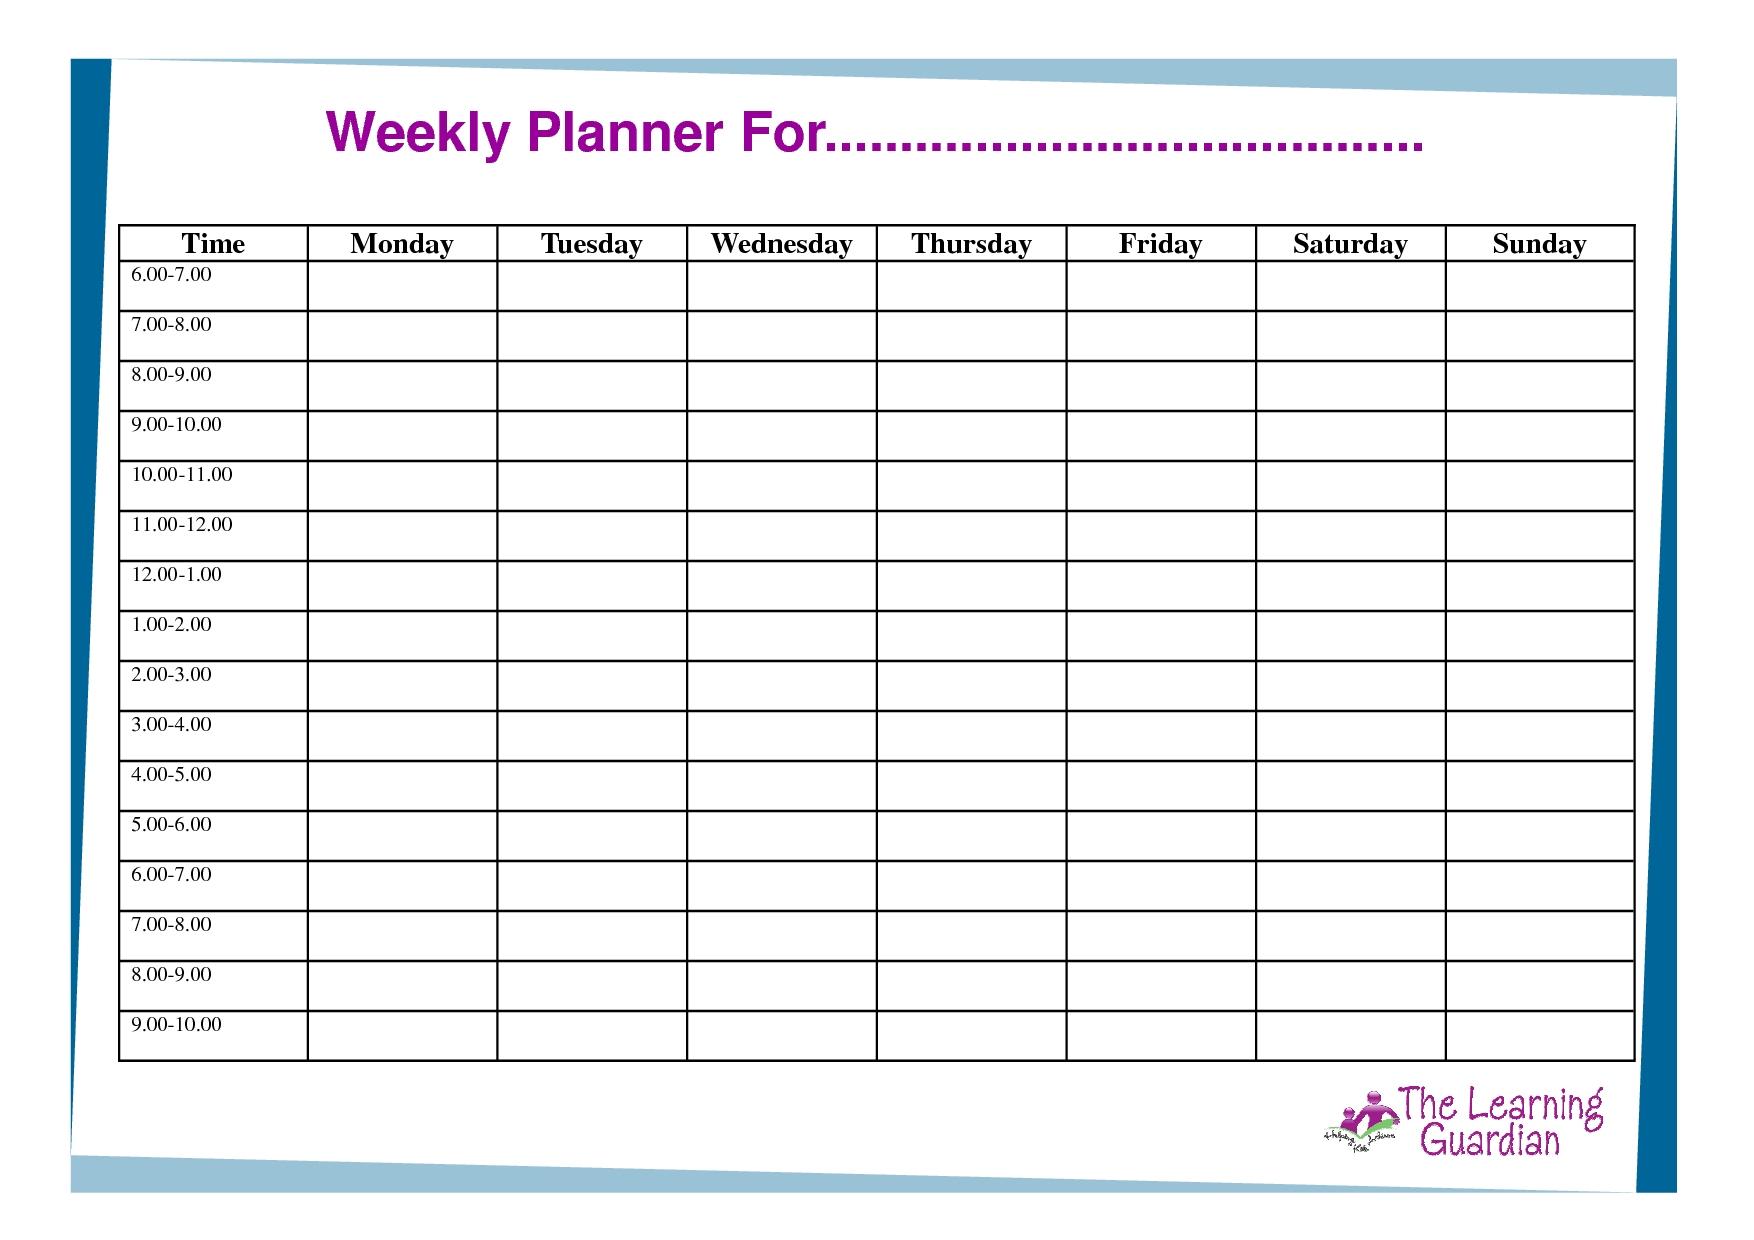 One Week Calendar With Hours – Calendar Inspiration Design One Week Calendar To Type In